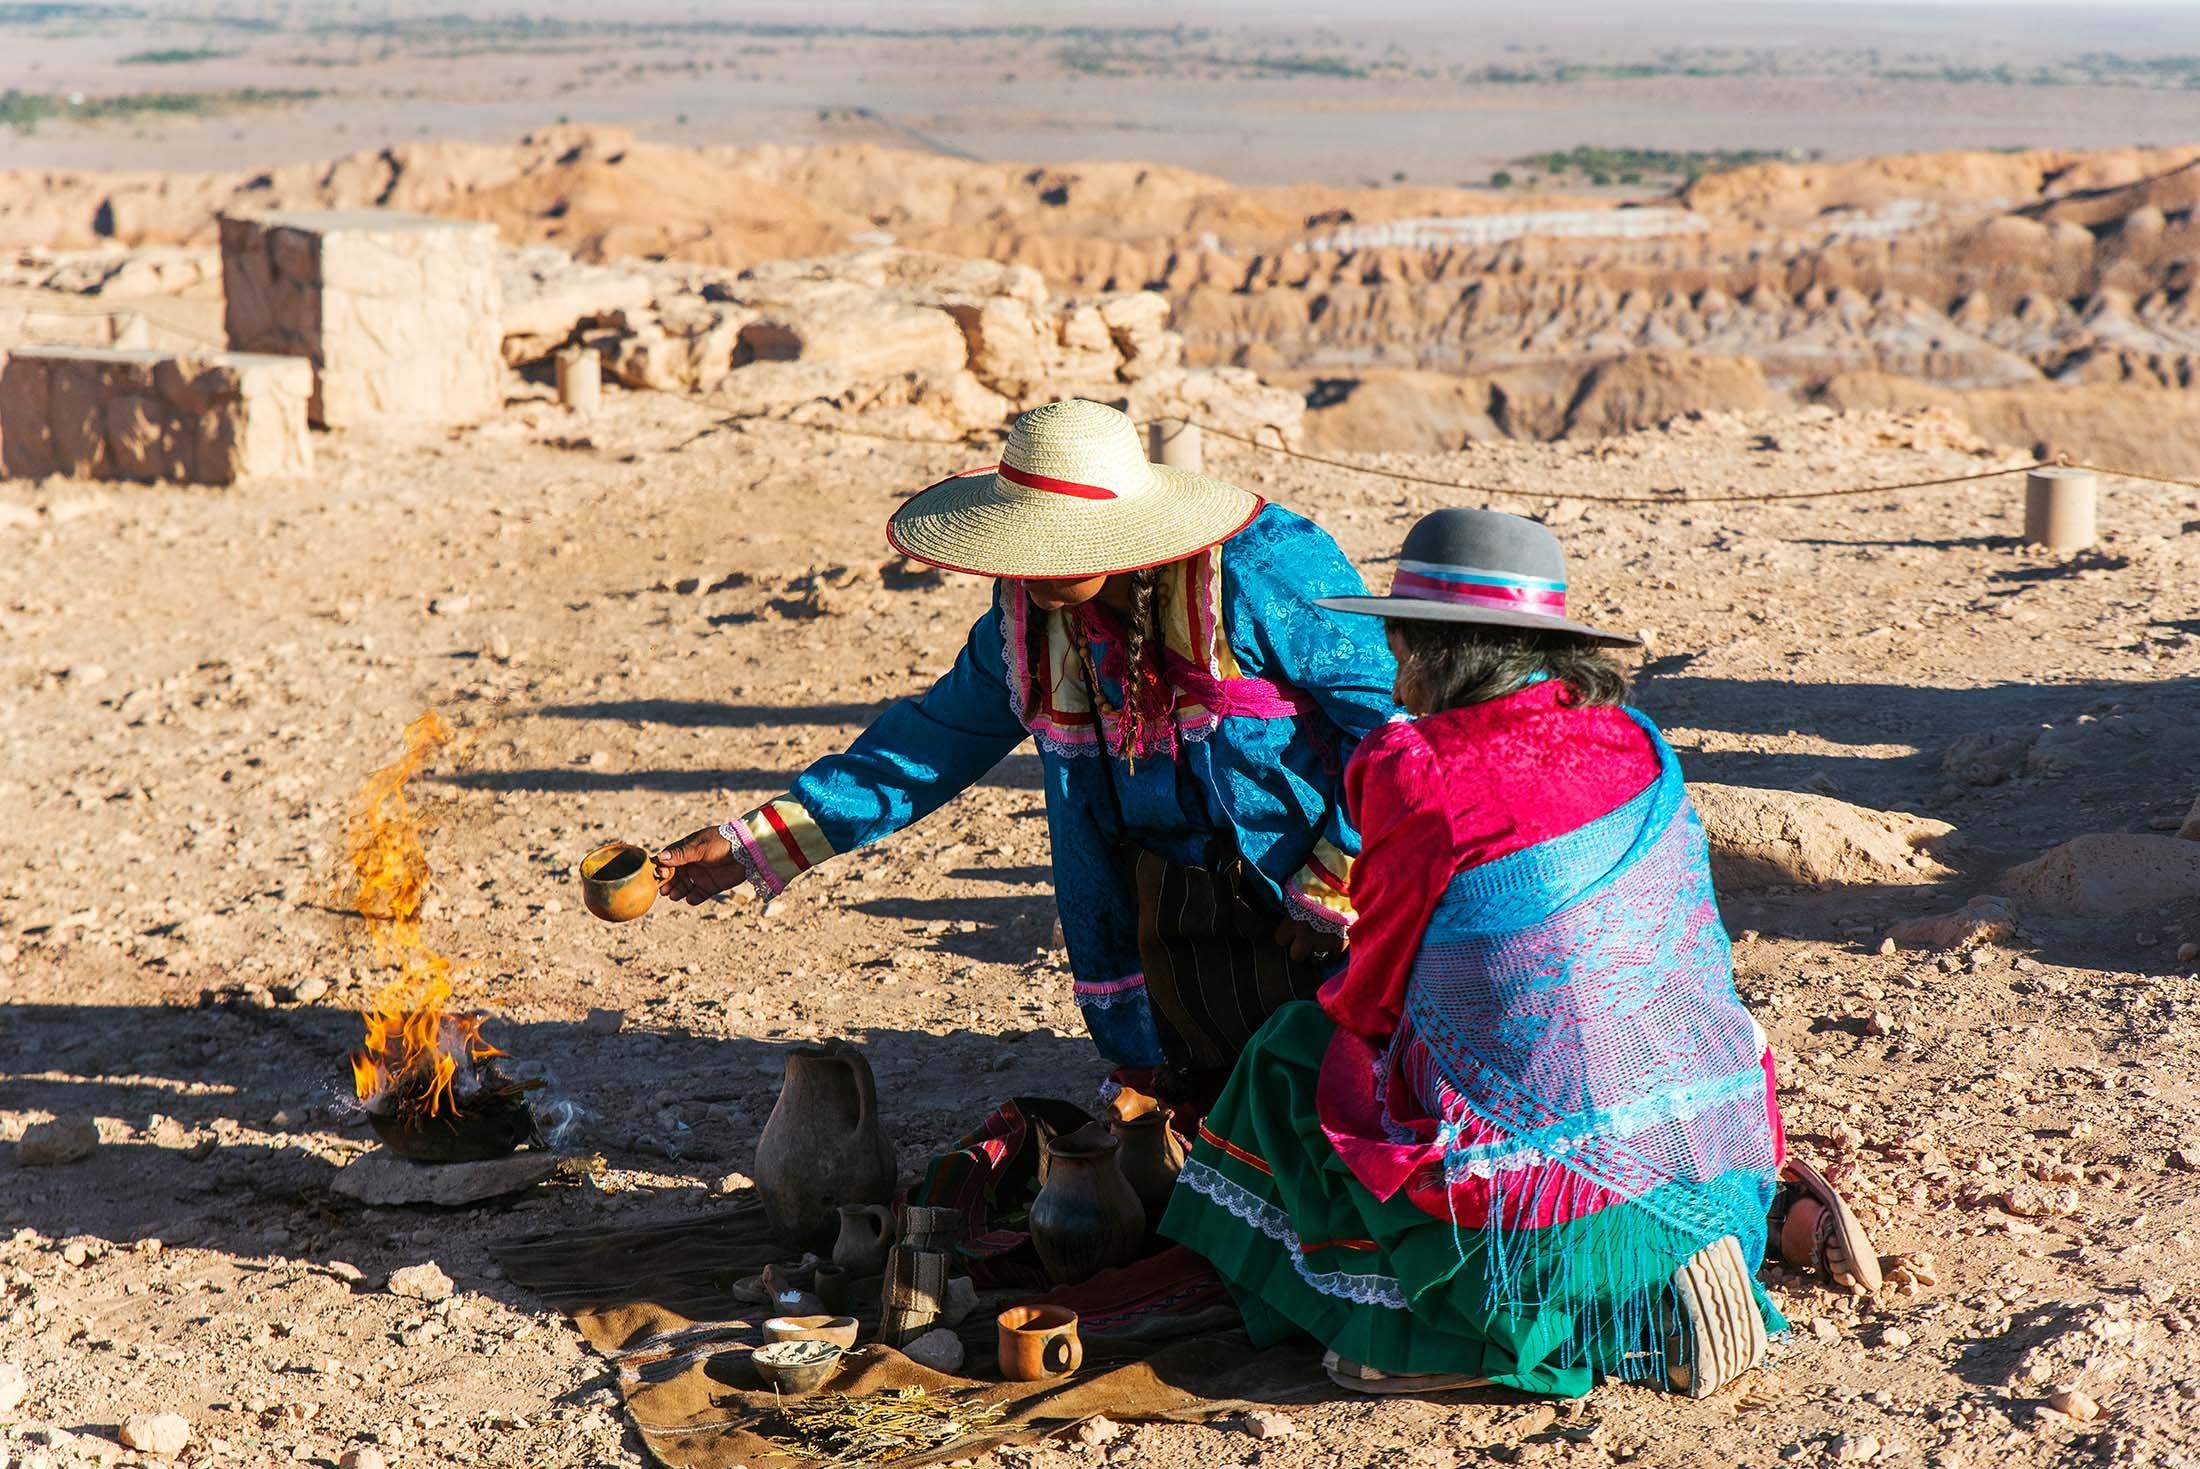 Pachamama ceremony in the Atacama Desert, Antofagasta, Chile